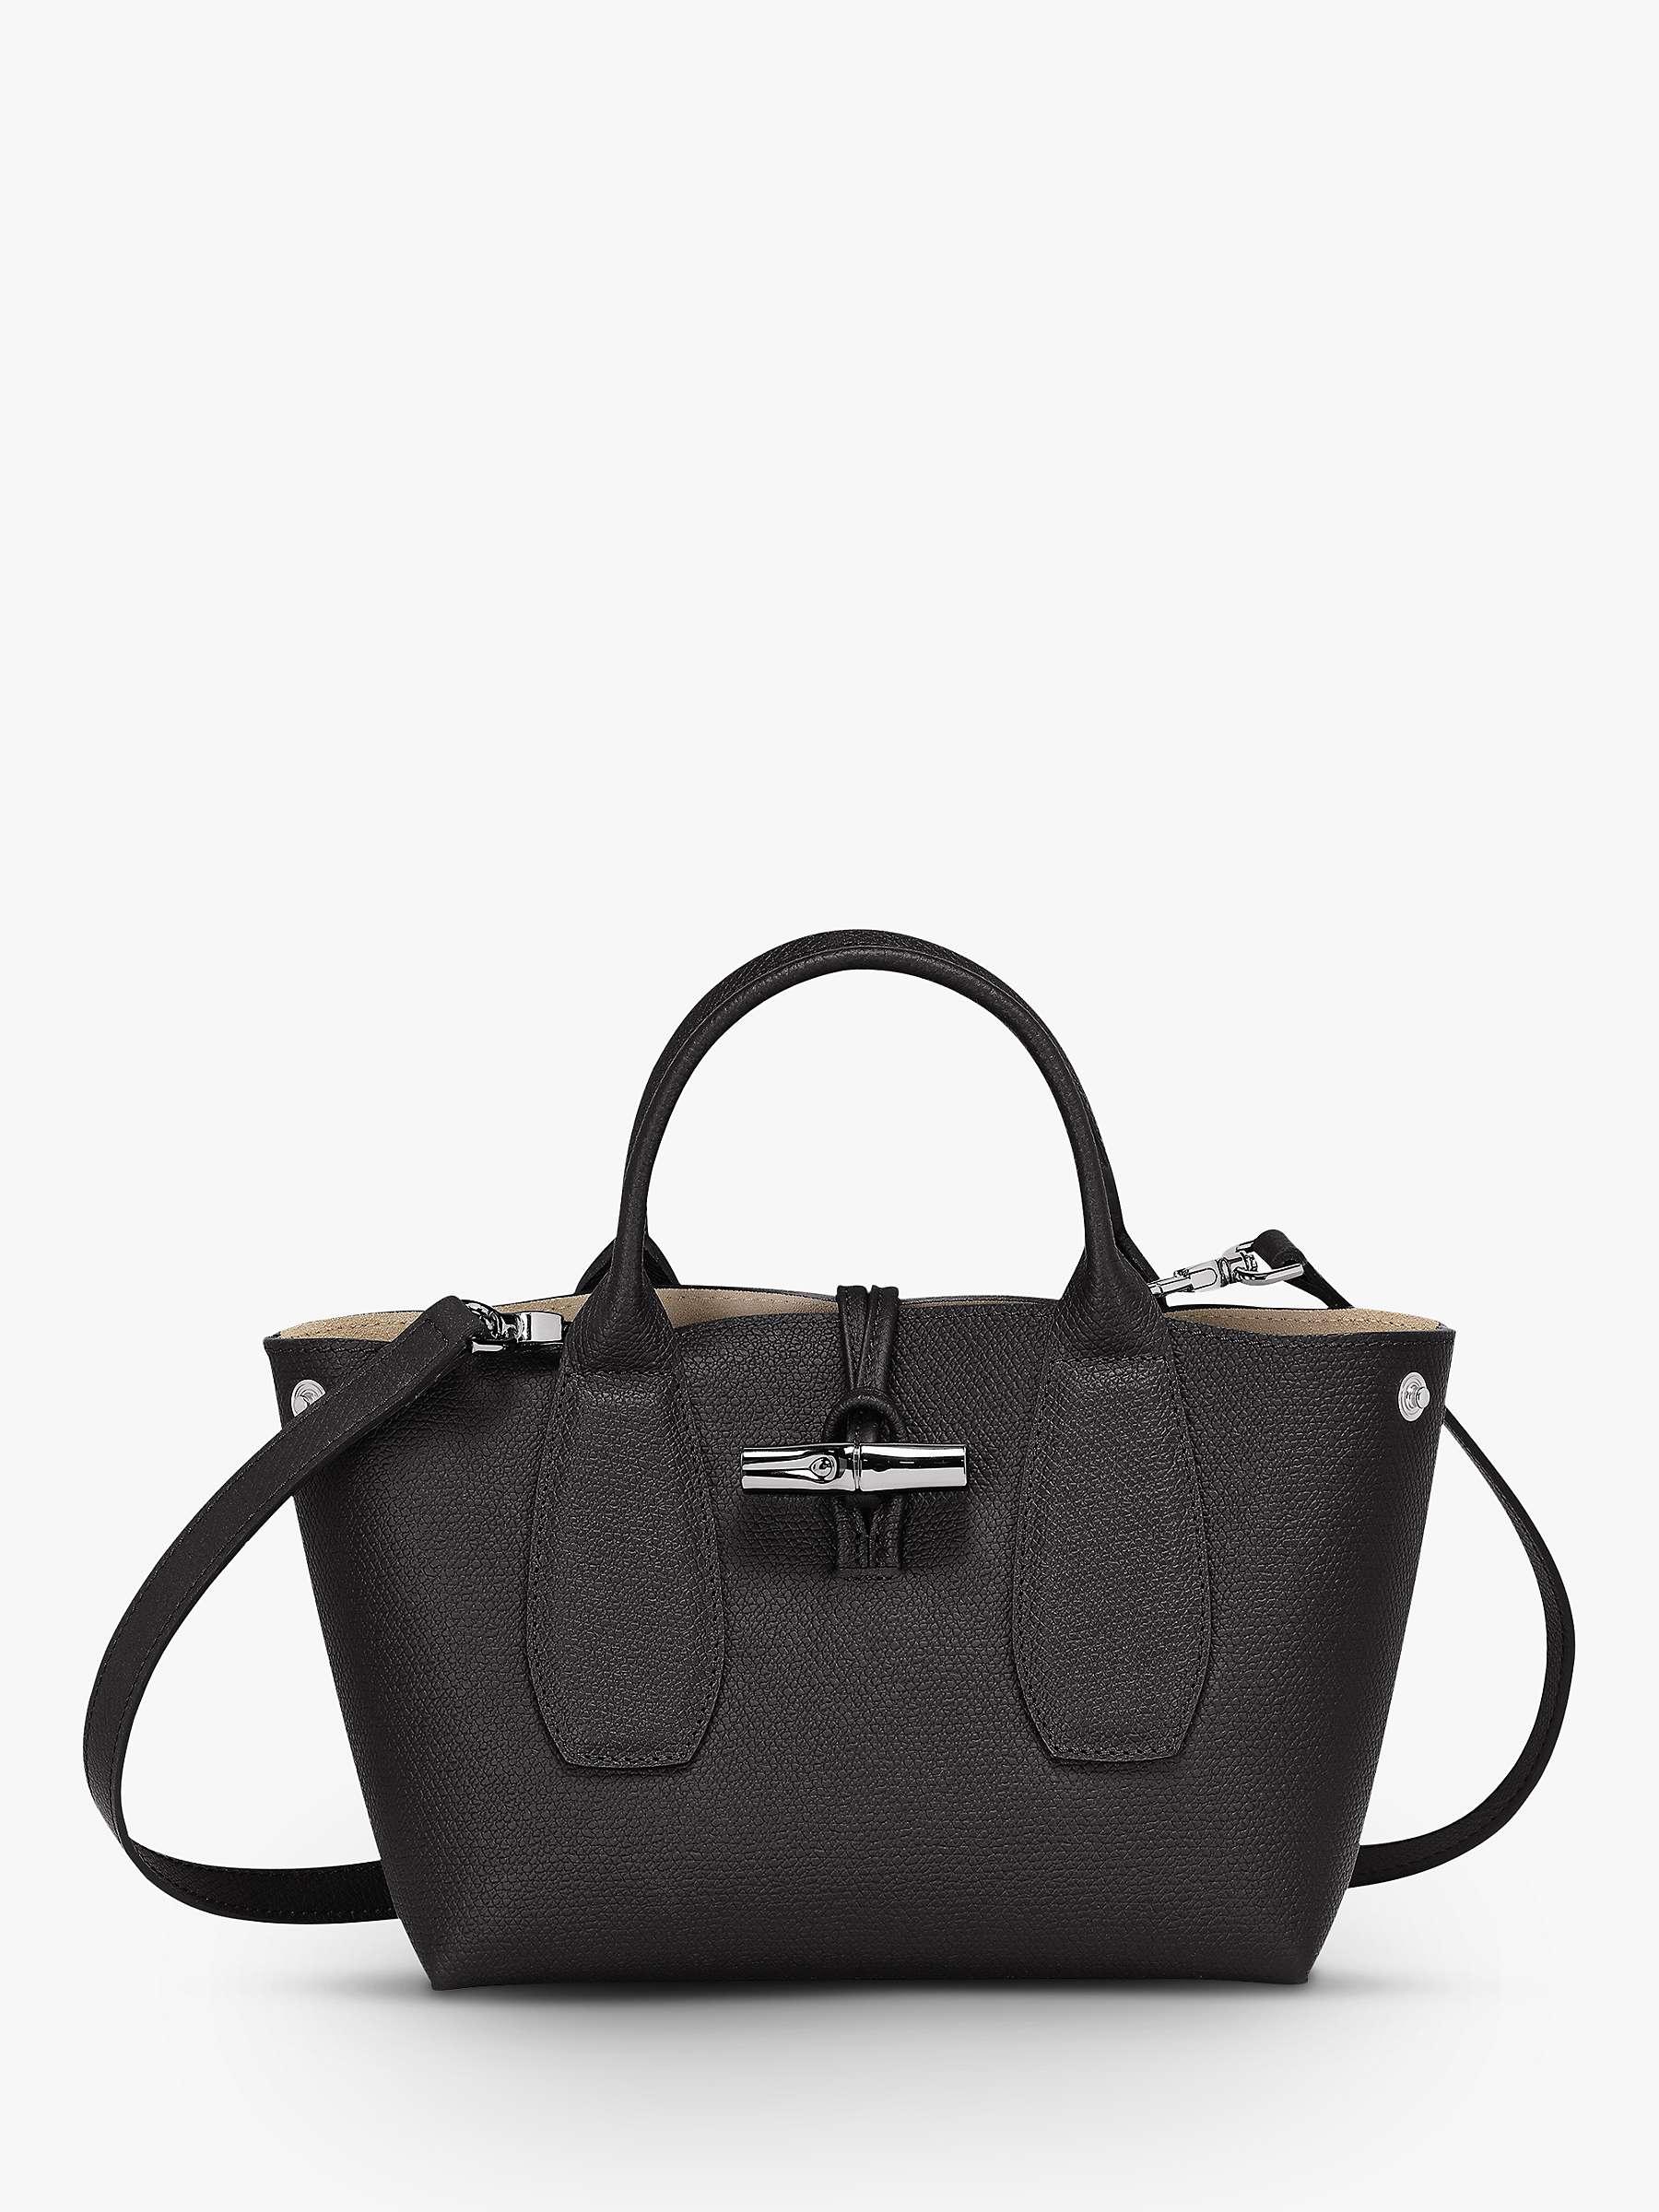 Longchamp Roseau Small Leather Top Handle Bag, Black